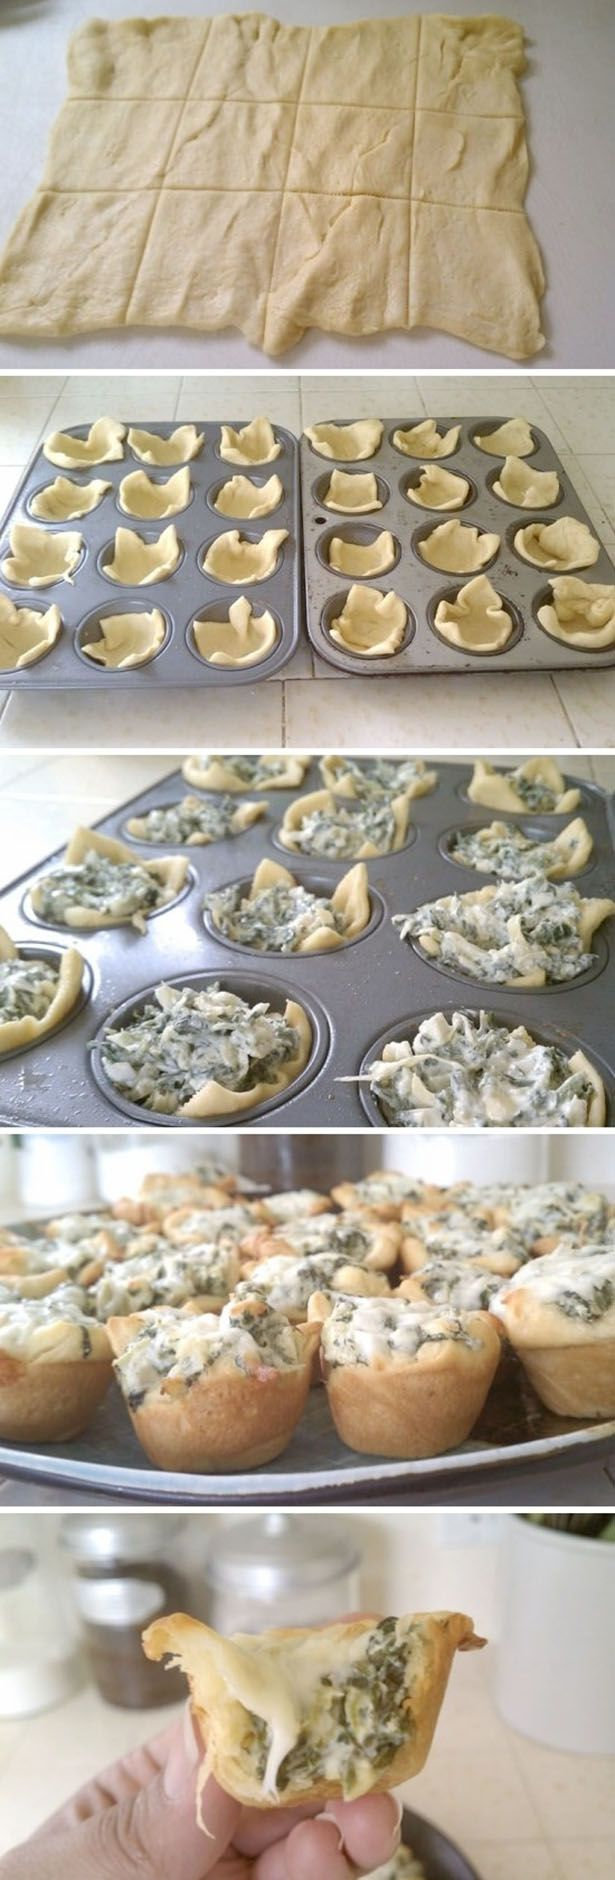 Muffin Tin Recipes - OMG Cute Things